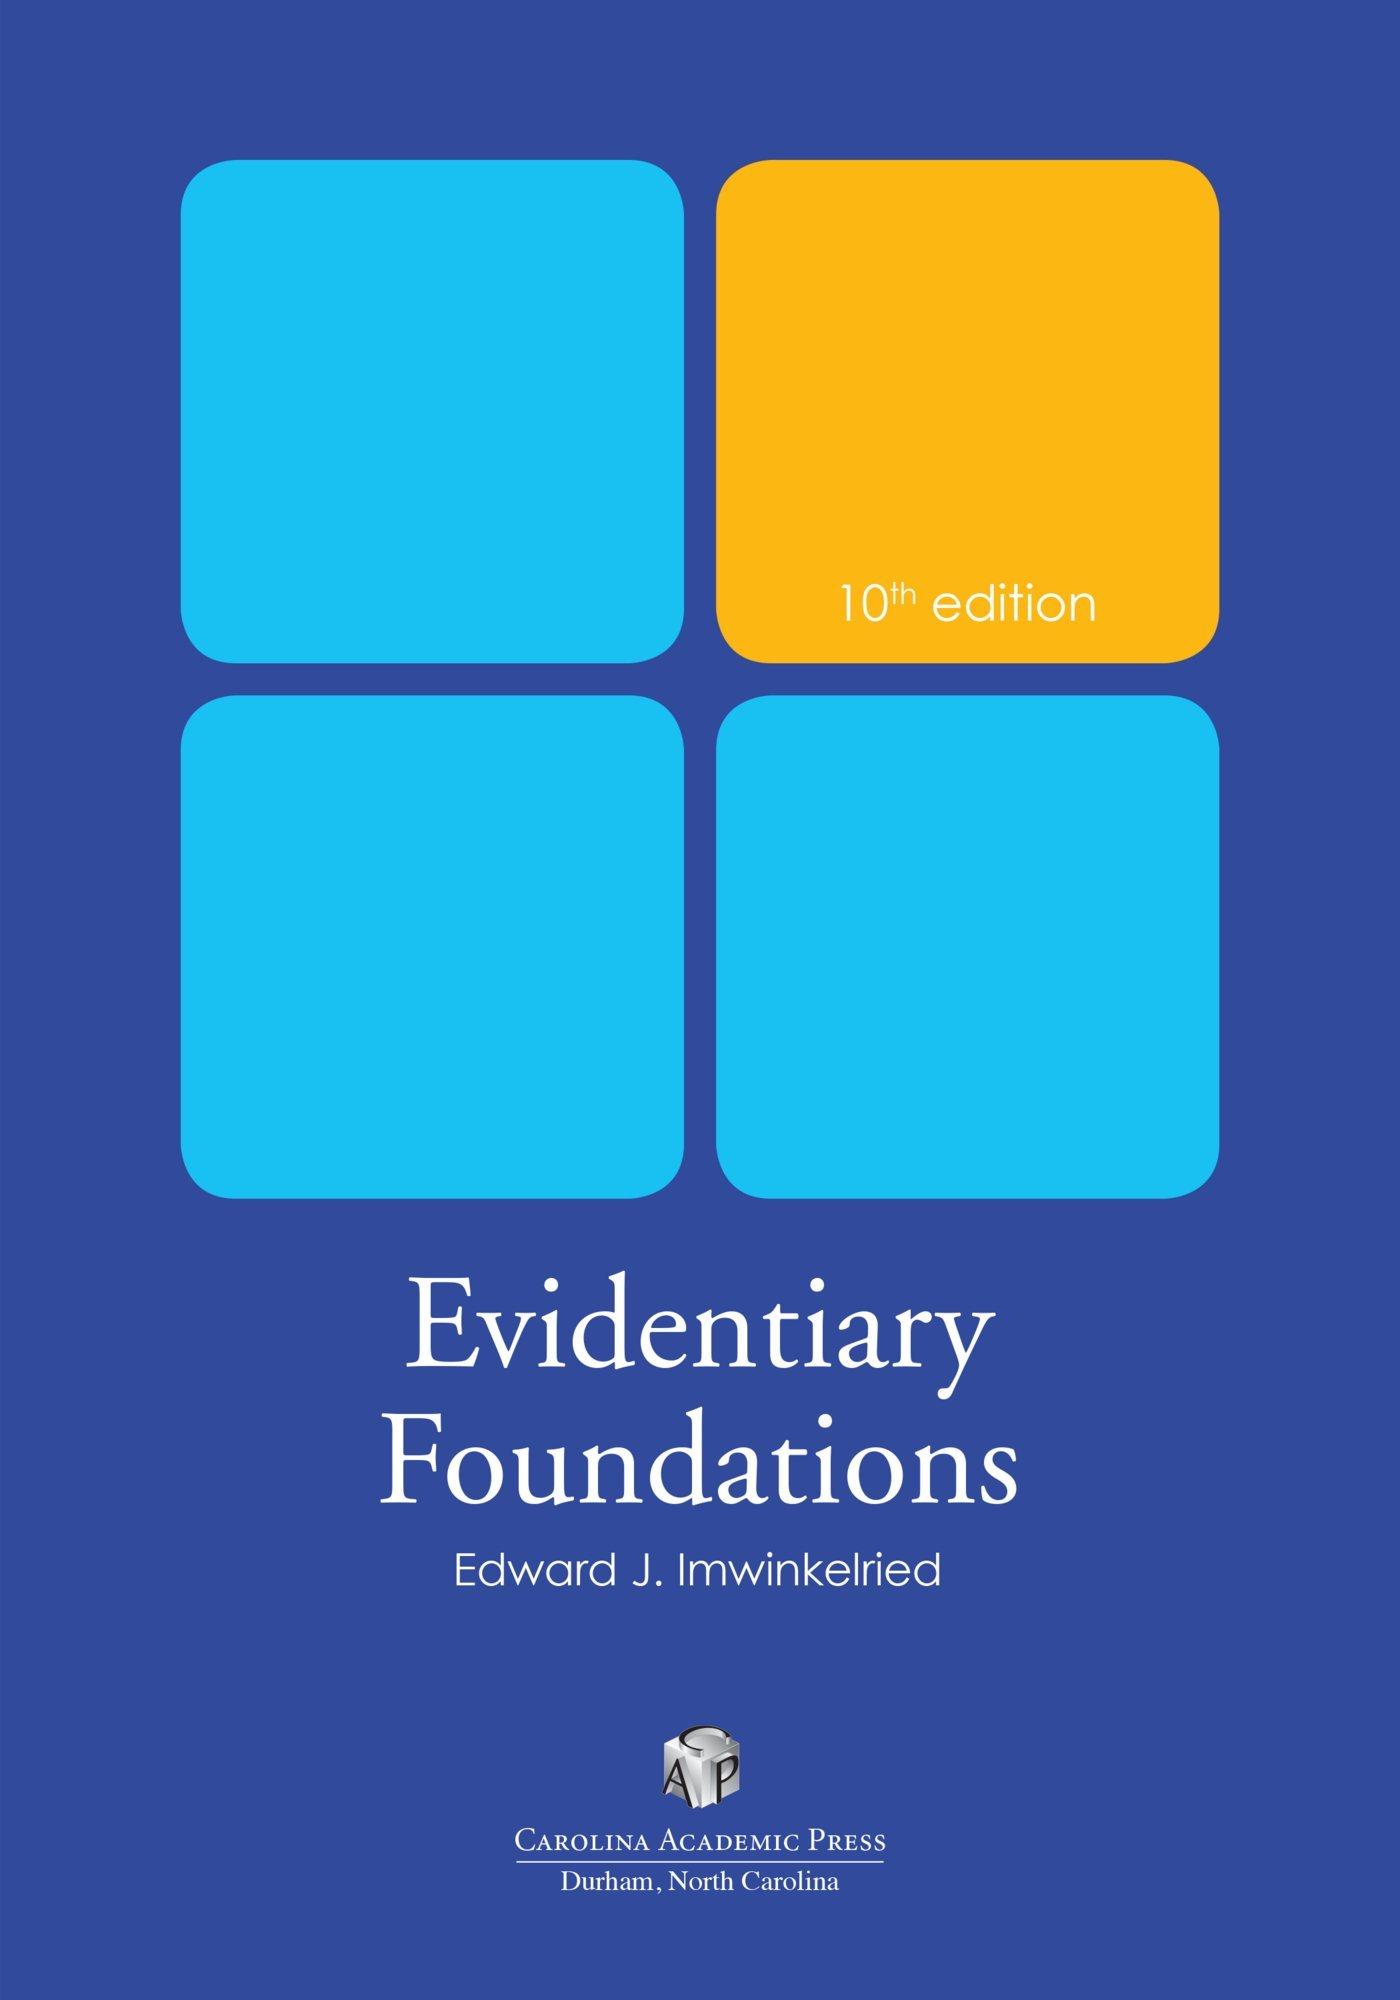 Evidentiary Foundations by Carolina Academic Press